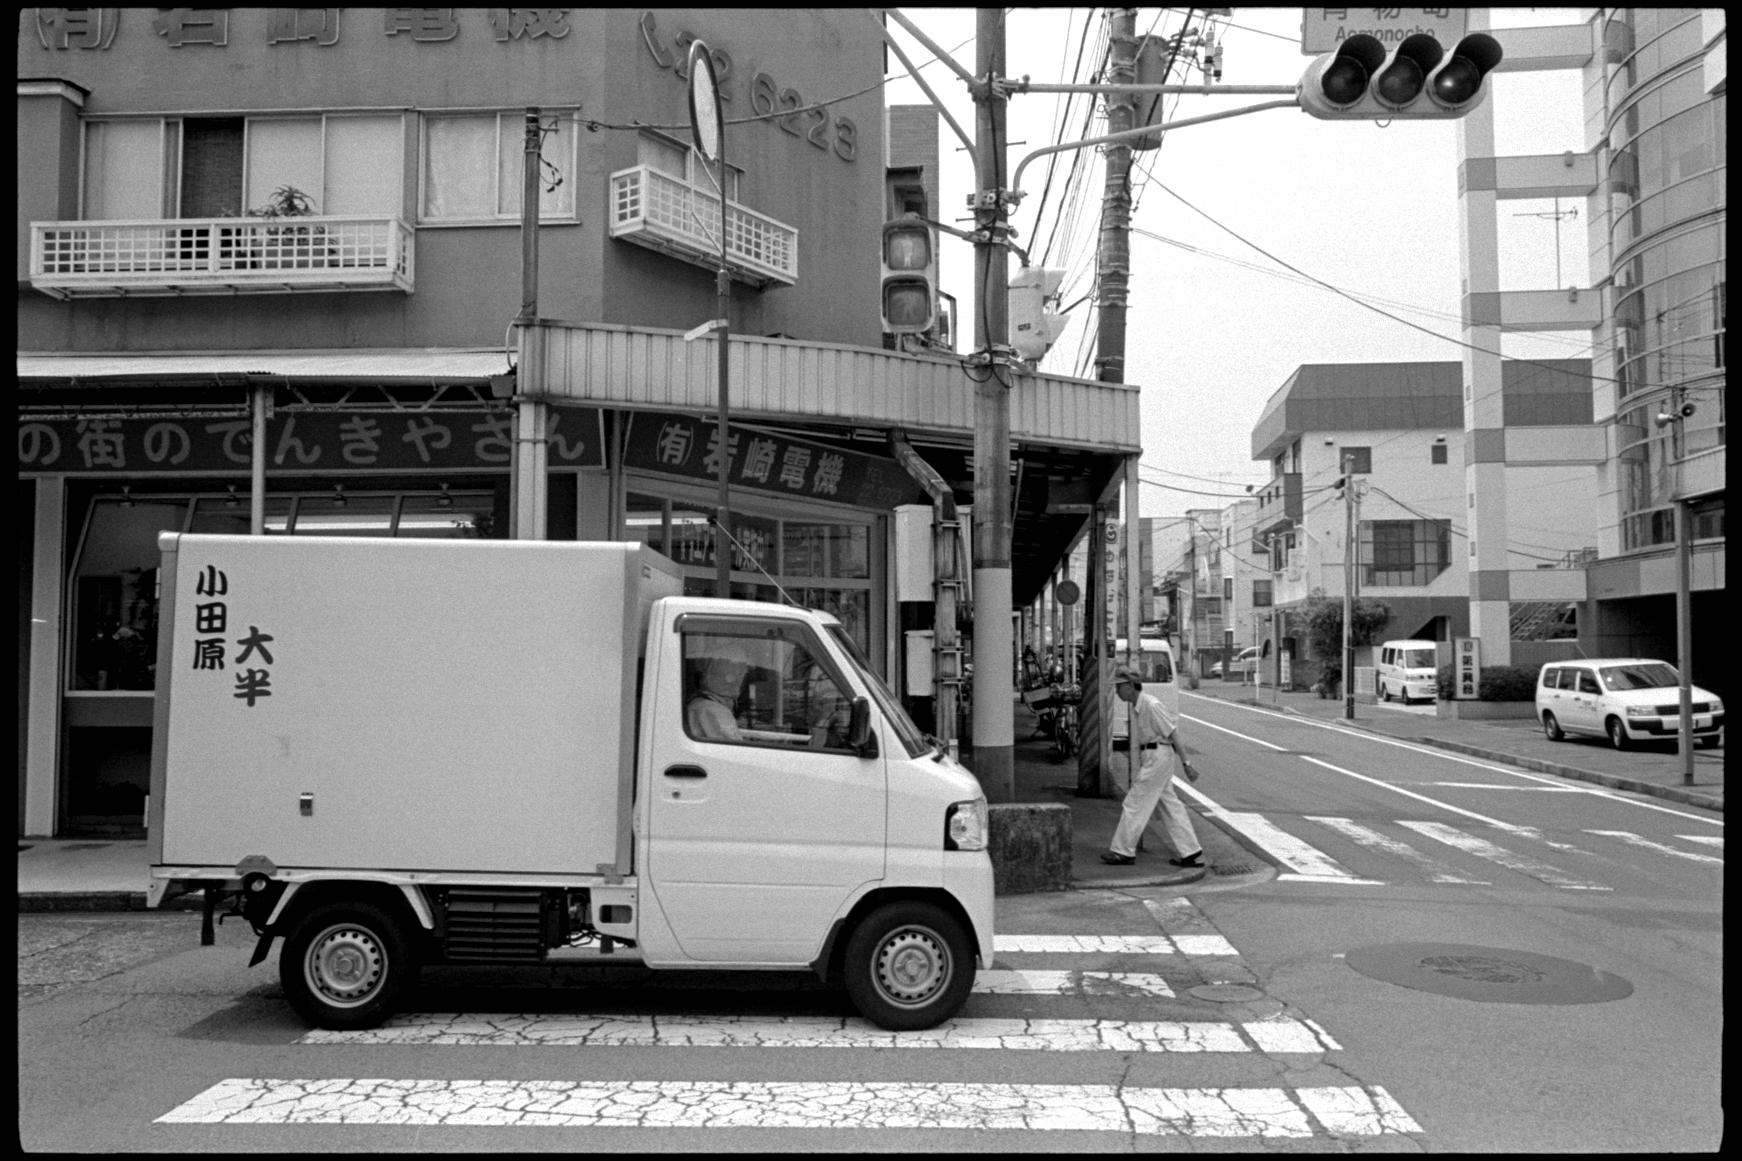 20140724 LeicaM4-P elmarit28 400TX D76 031